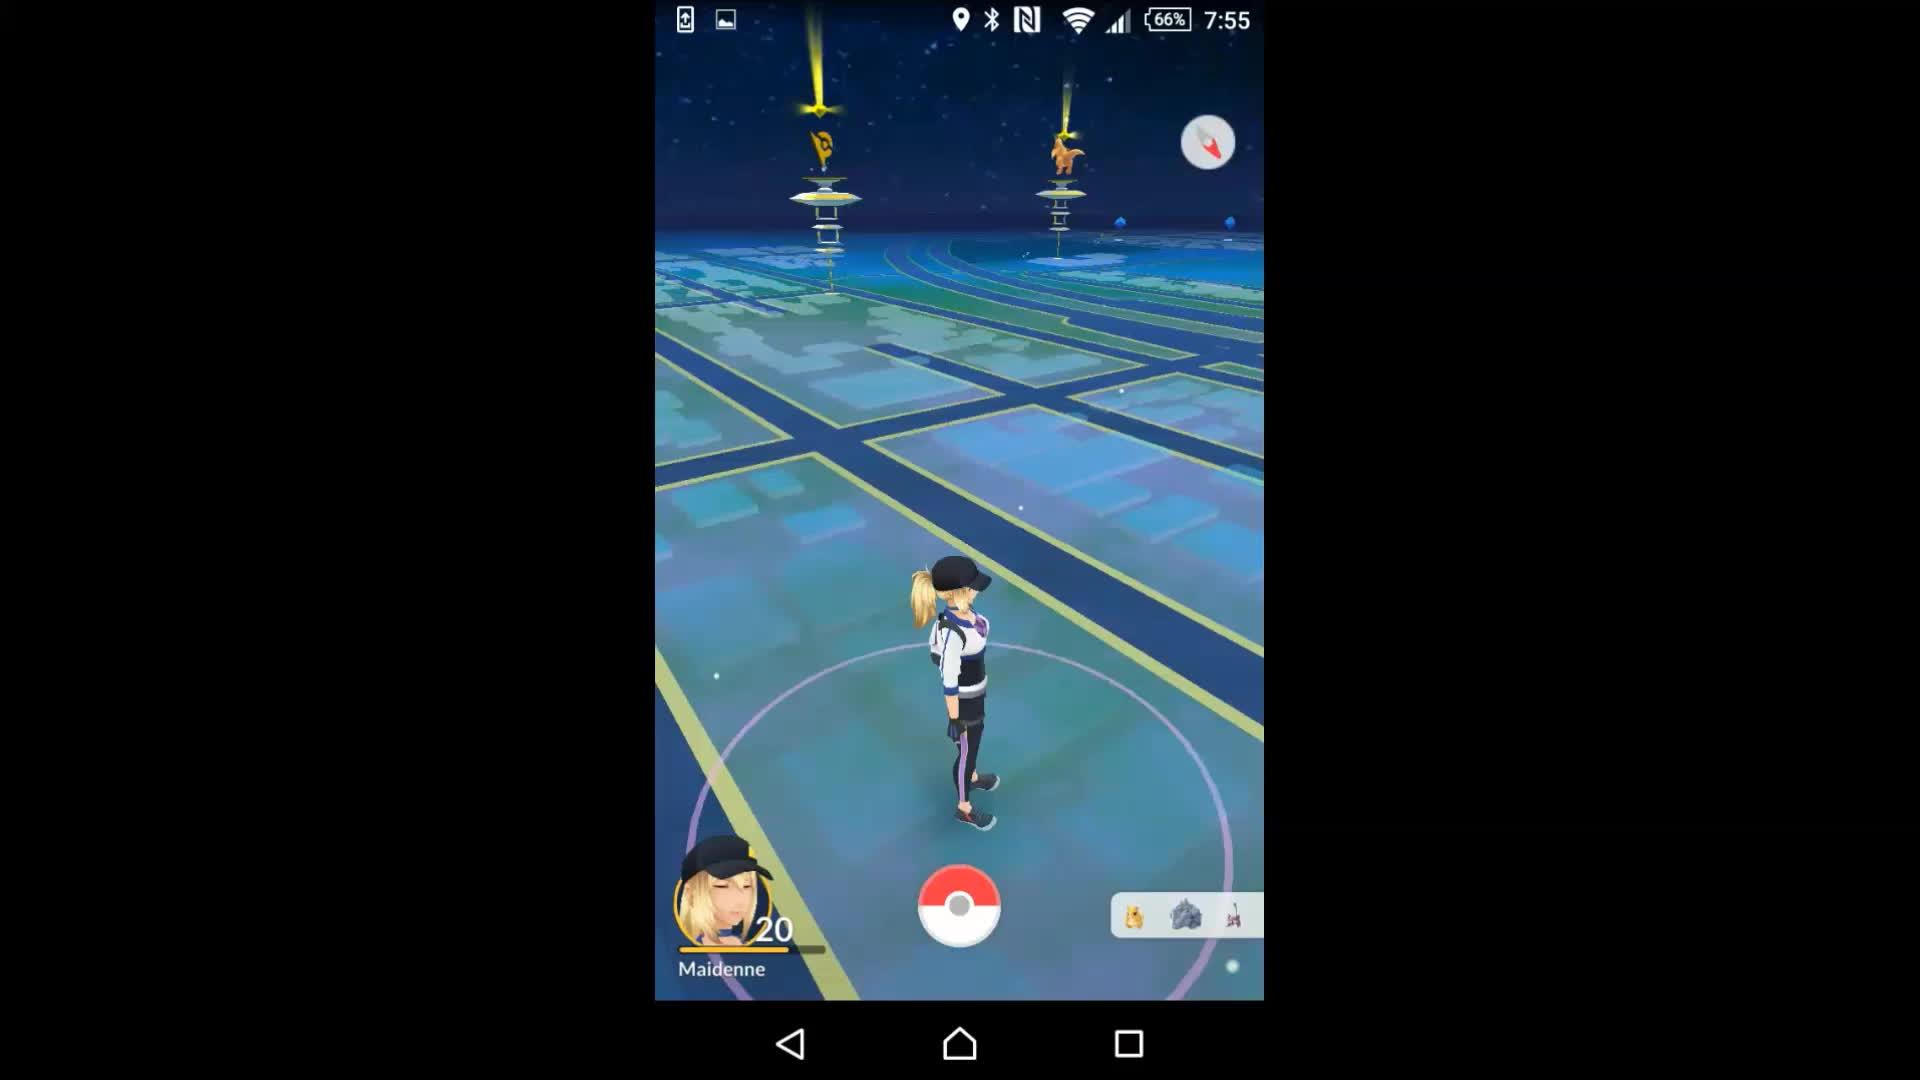 [PokemonGO] 4/6 Instinct Gyms GIFs